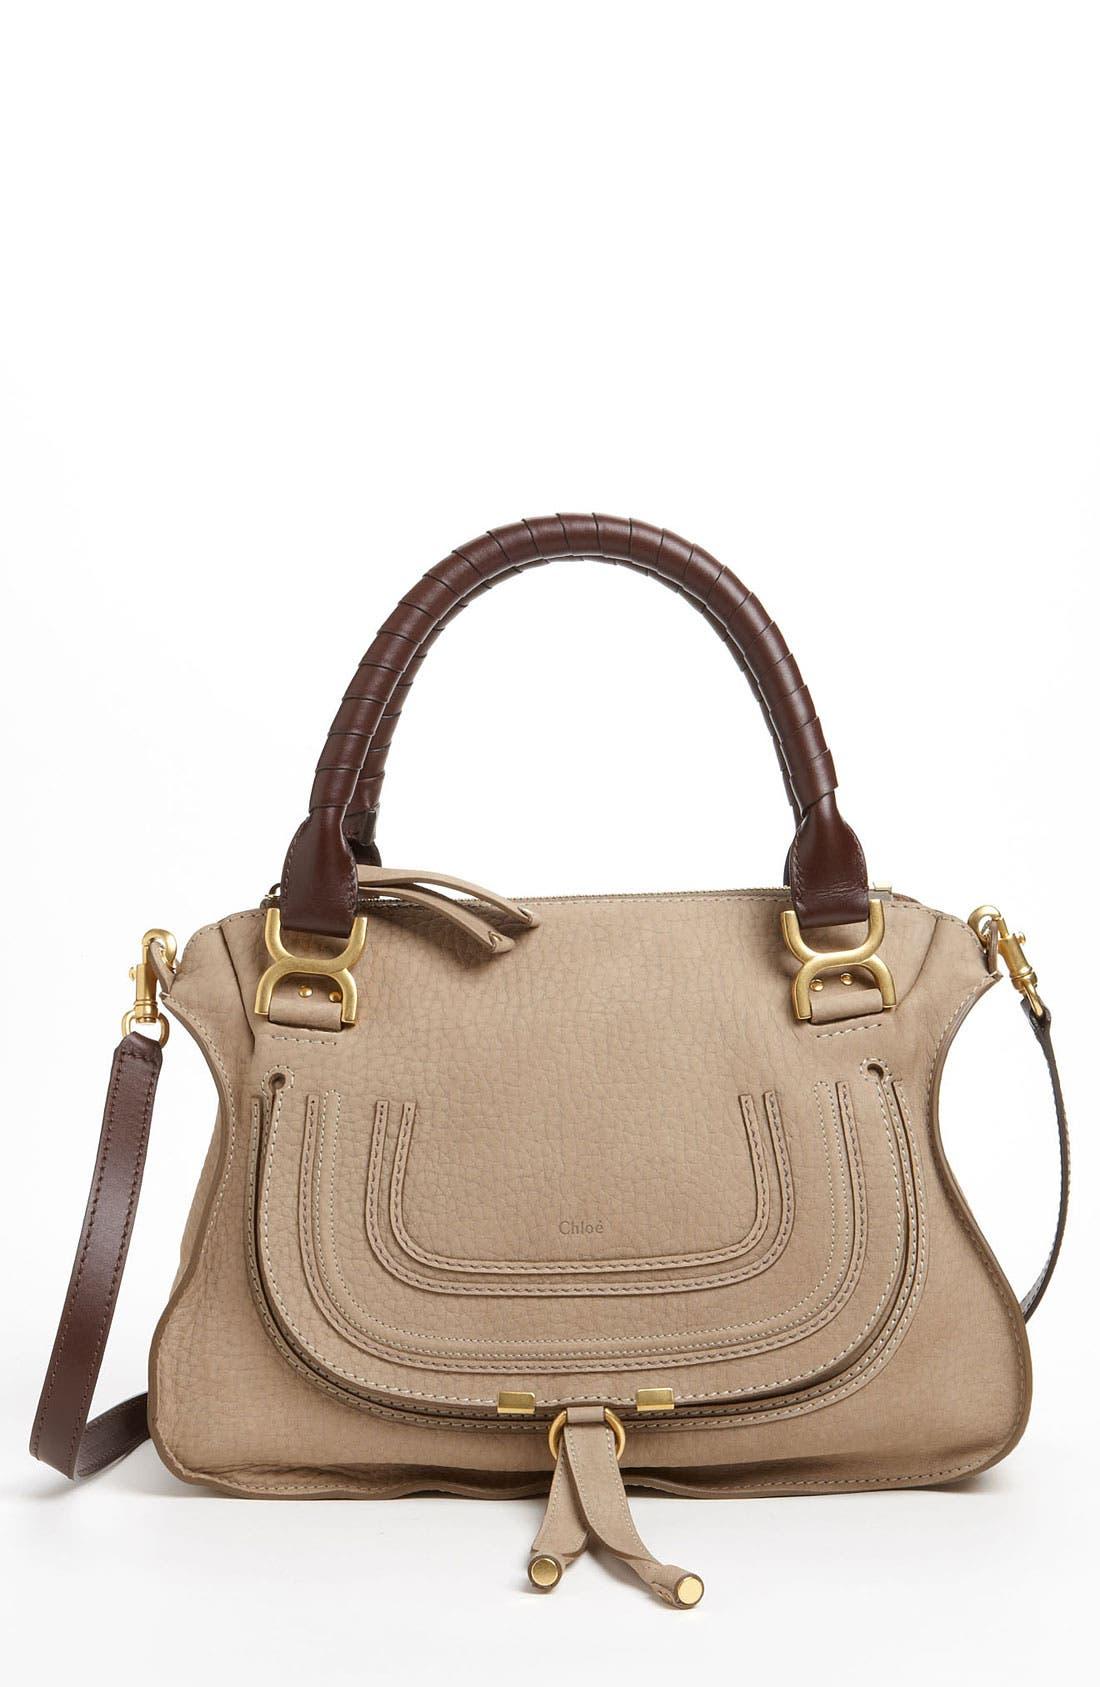 Main Image - Chloé 'Marcie -Small' Nubuck Leather Shoulder Bag